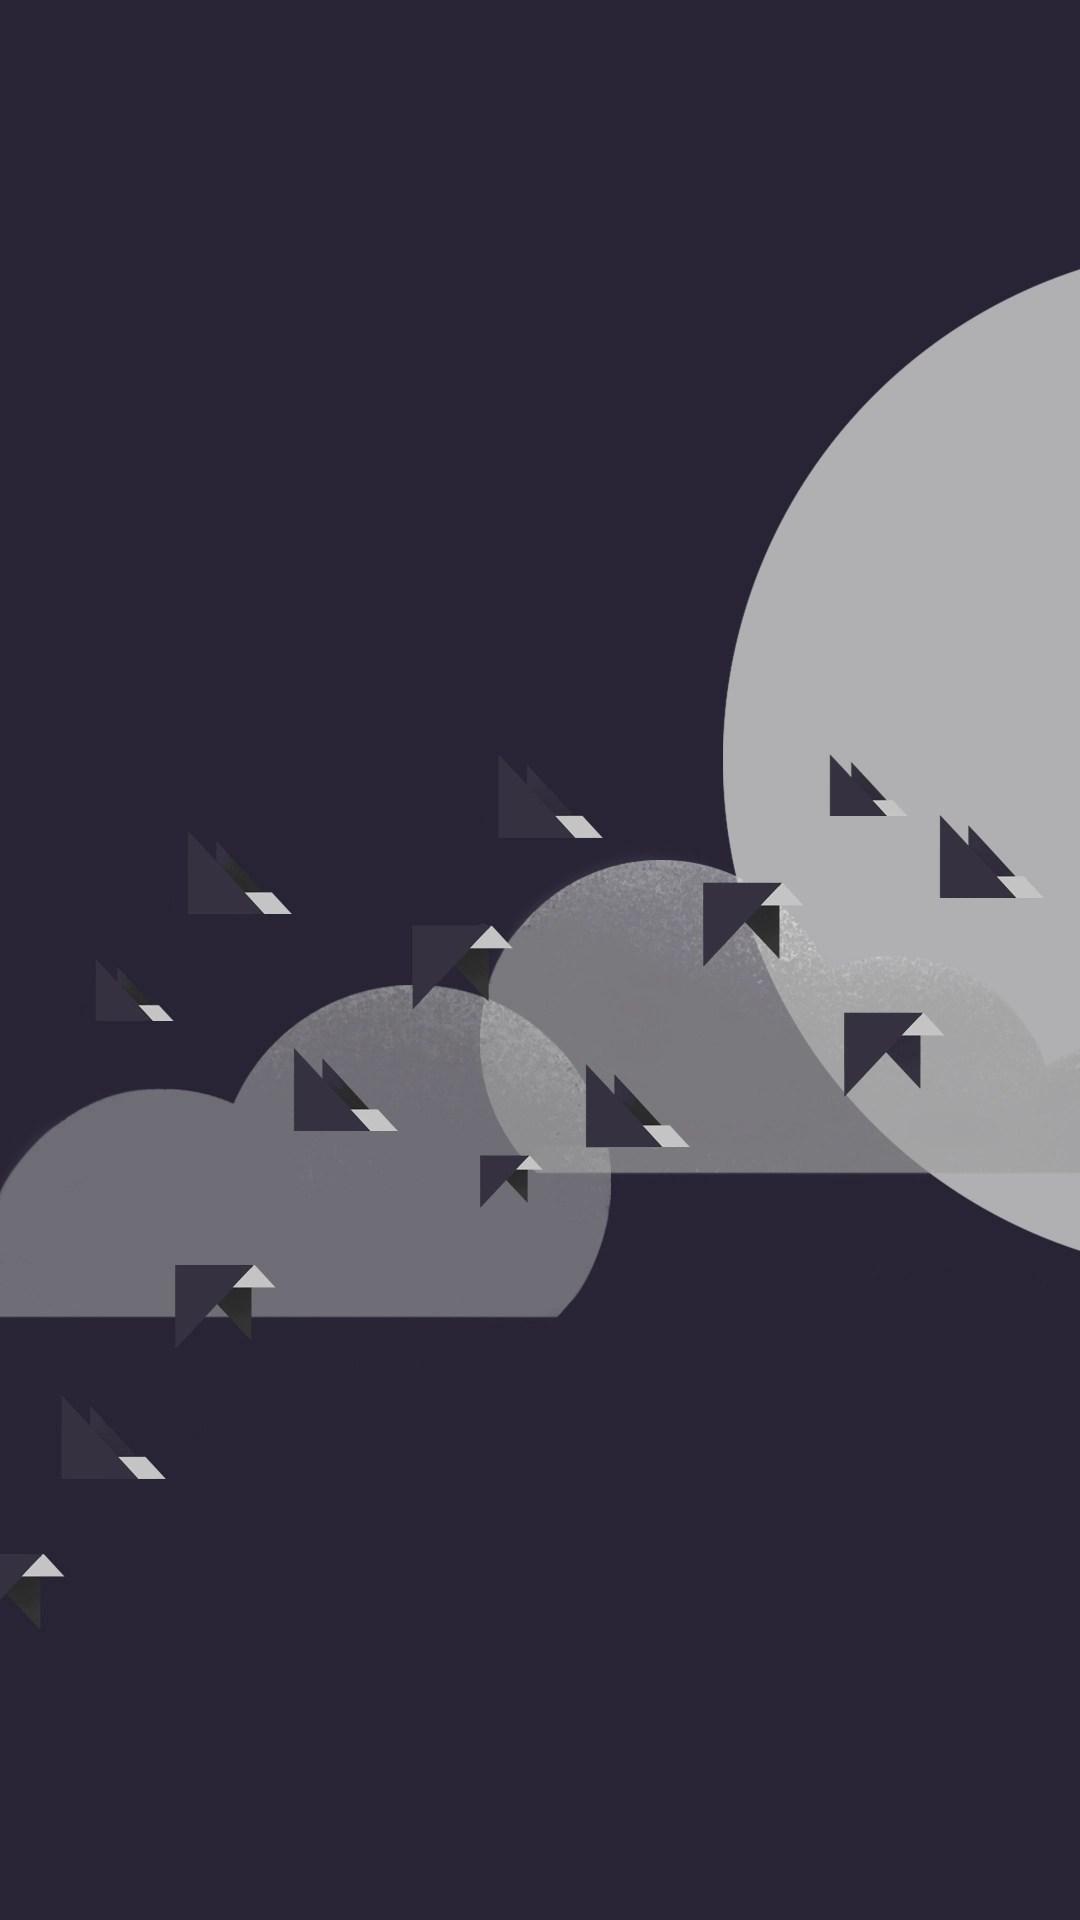 moonshine OnePlus 2 Wallpapers